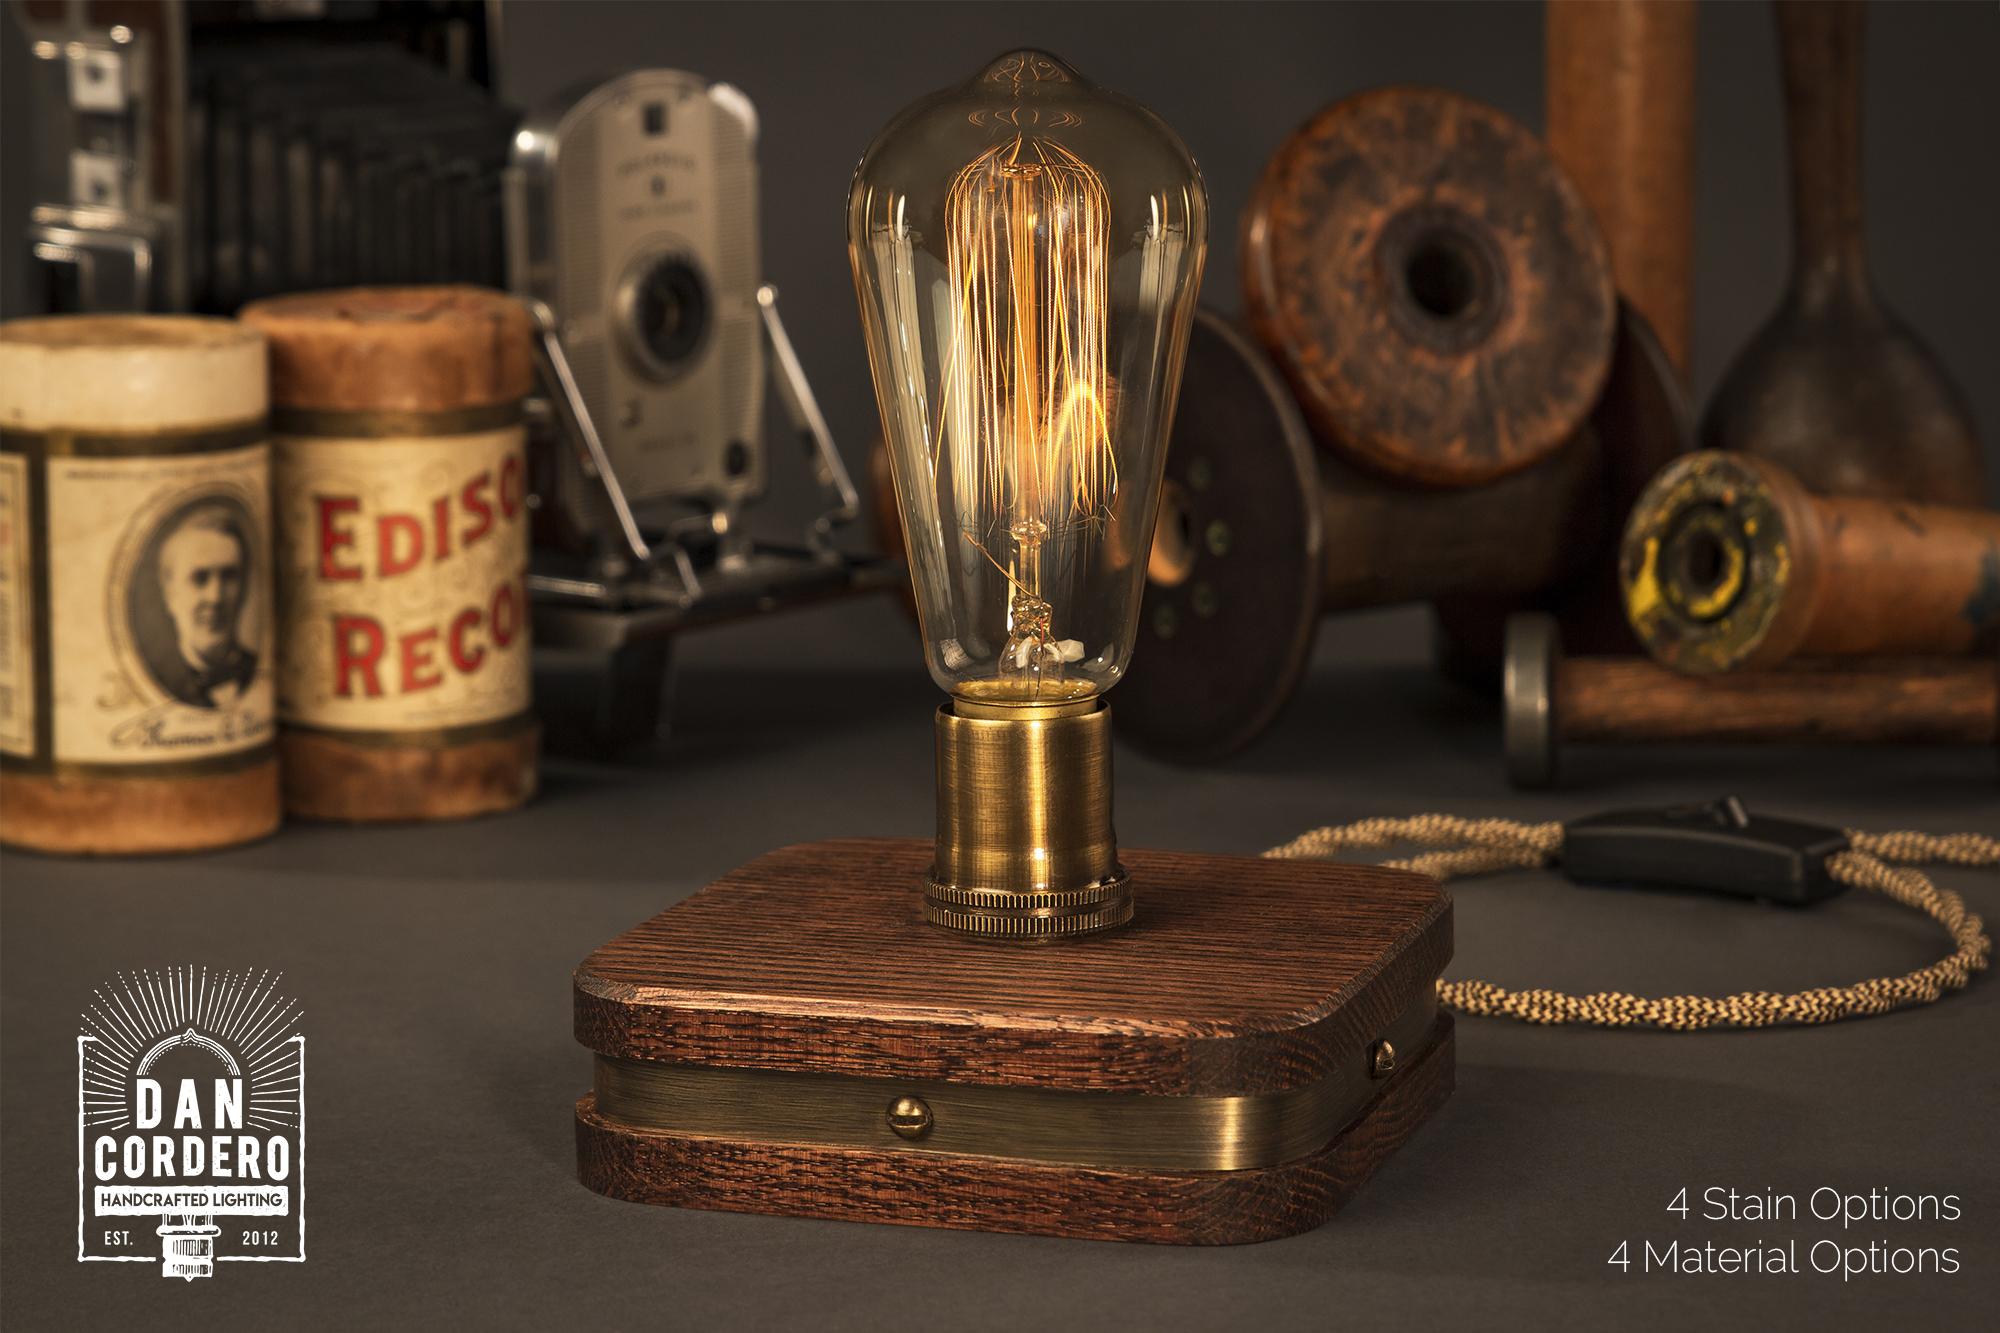 The Menlo Edison Lamp